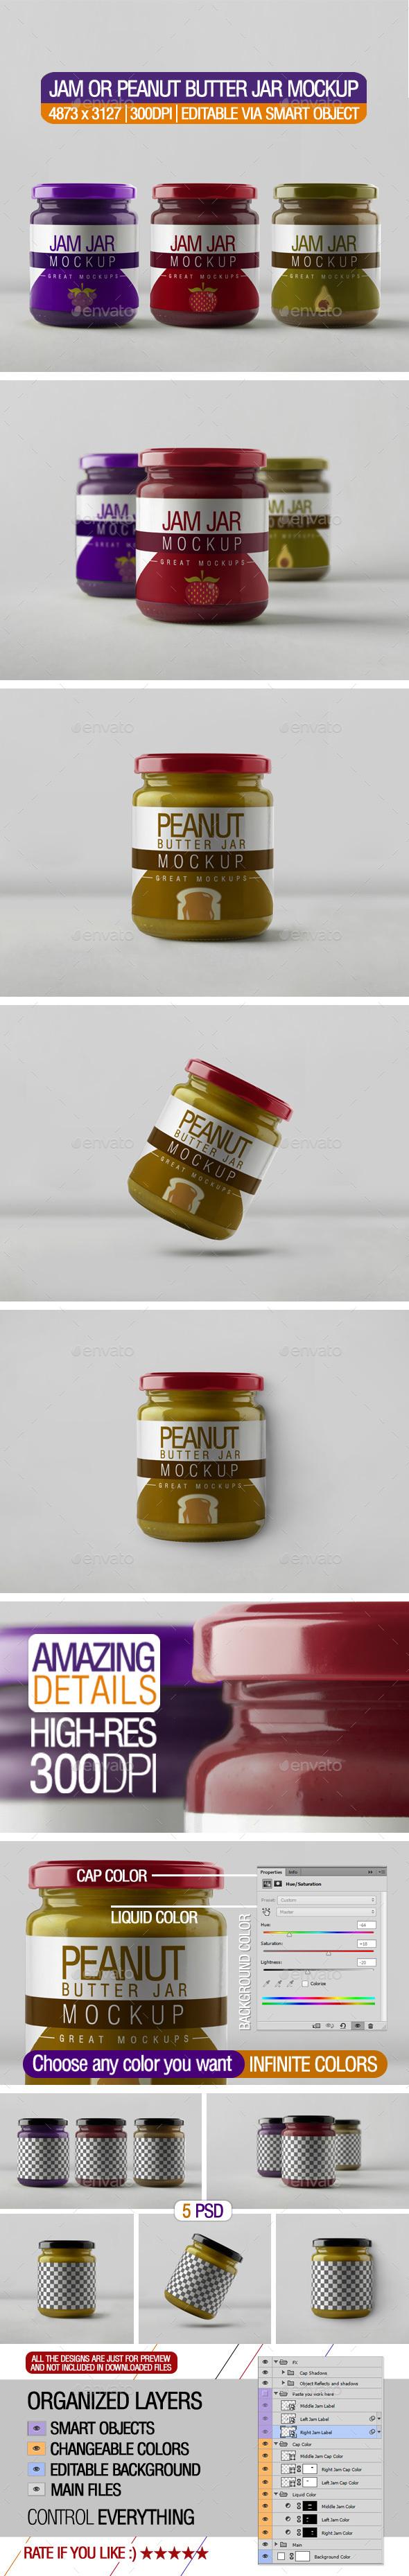 Jam or Peanut Butter Jar Mockup - Food and Drink Packaging